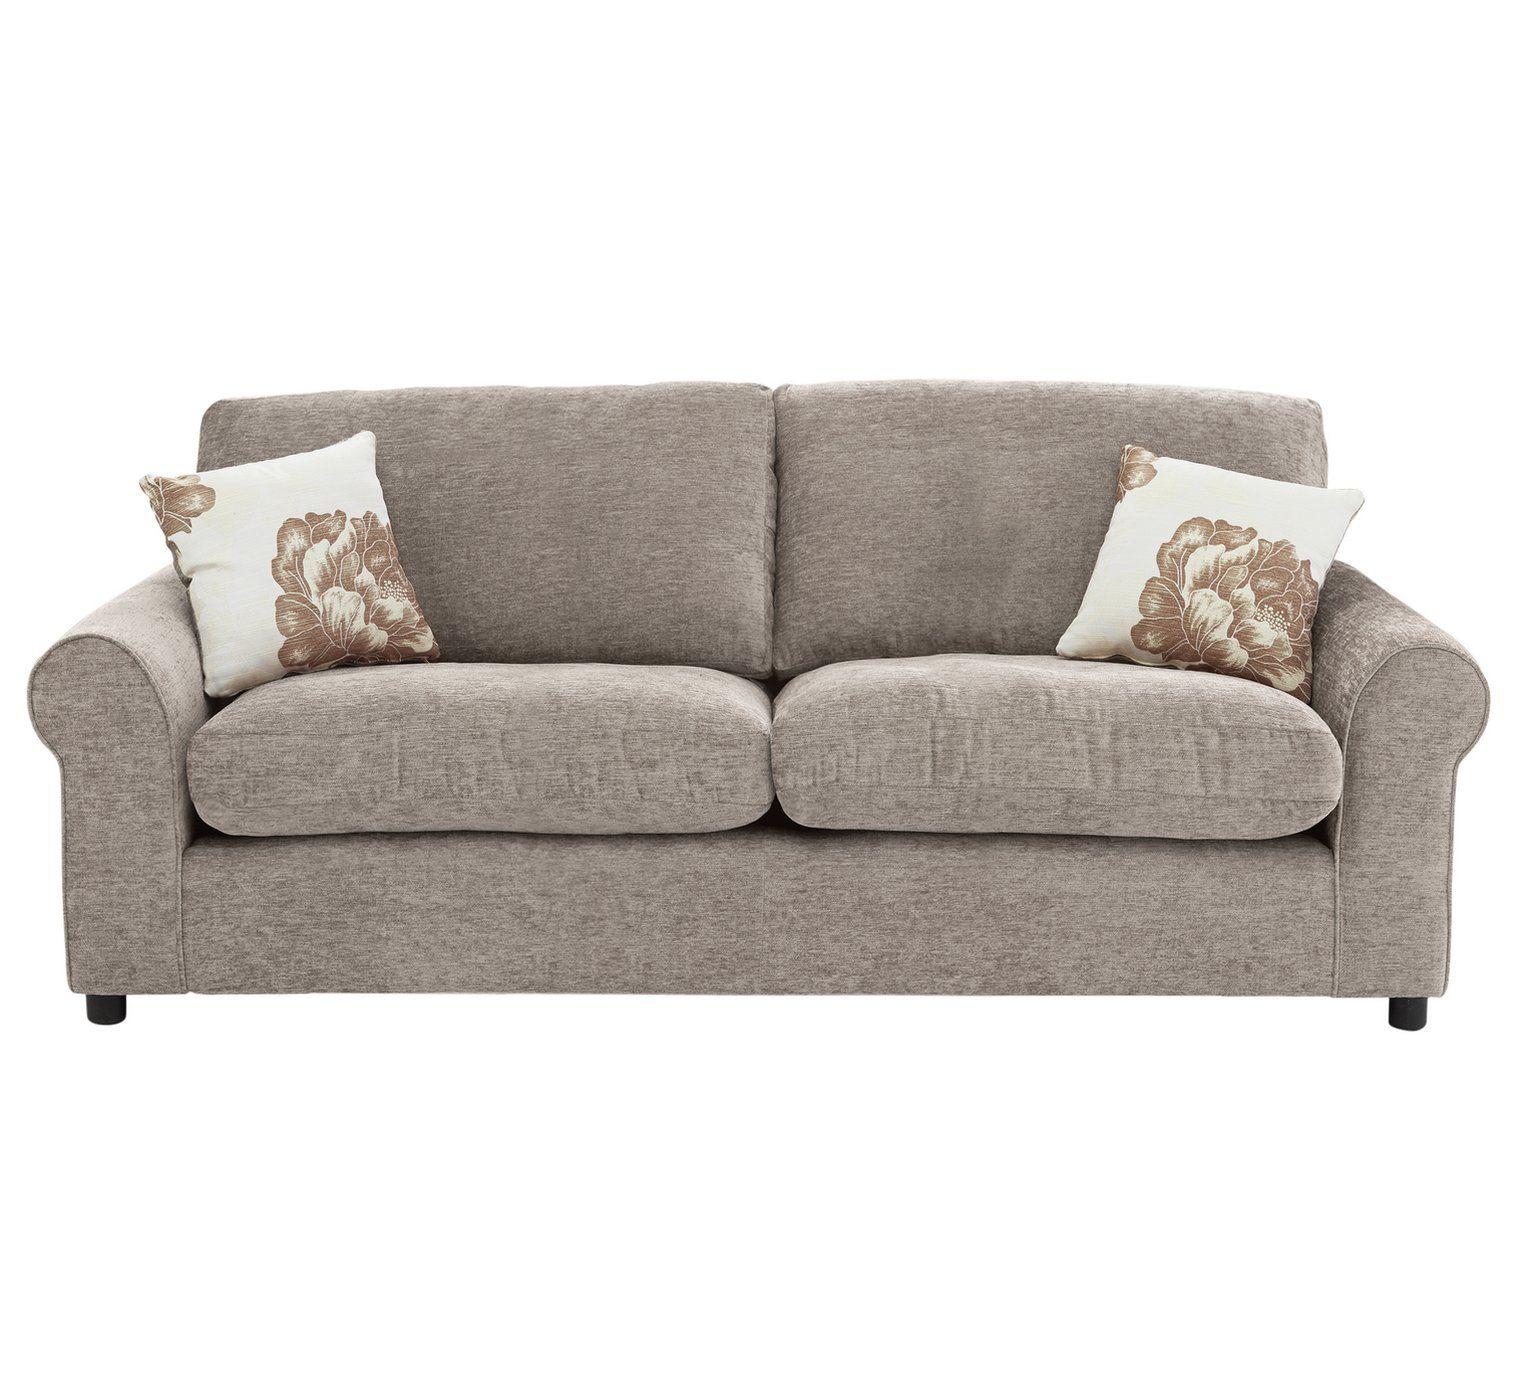 Buy home tessa fabric pair of 3 seater sofas mink sofa sets argos